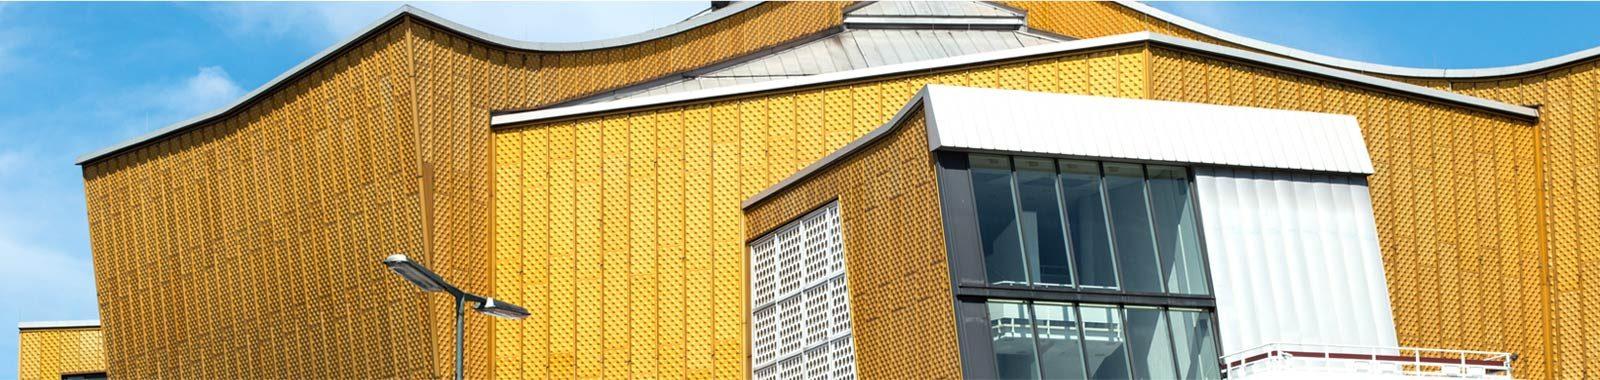 FLOTTWELL BERLIN Hotel - Theater / Oper / Show